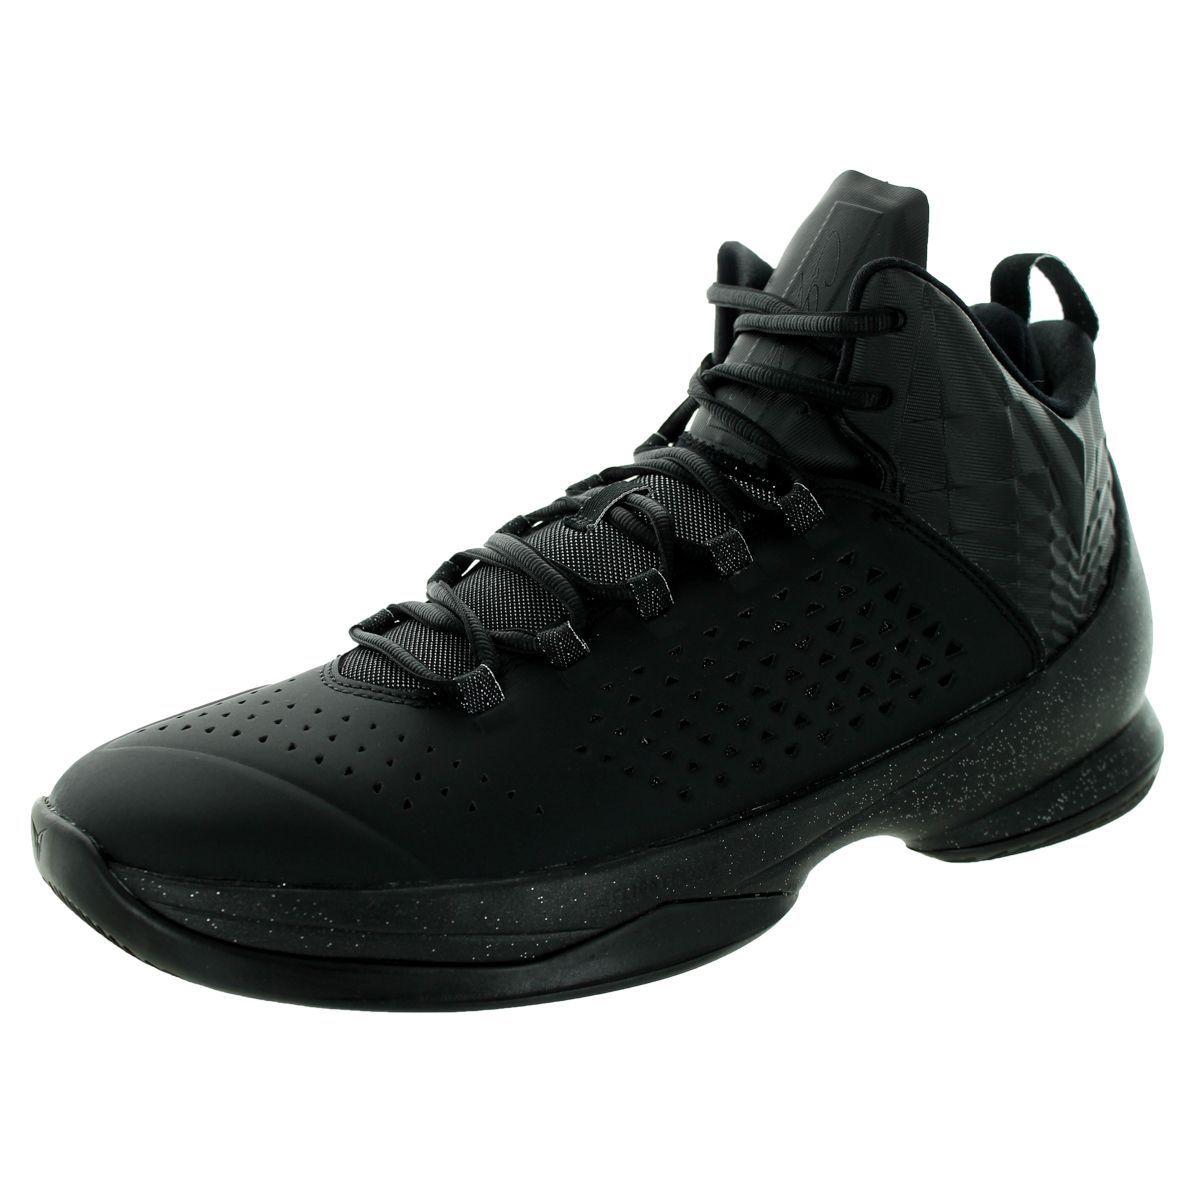 check out 0f5ce c7798 ... low price nike jordan mens jordan melo m11 basketball shoe c8776 1f476